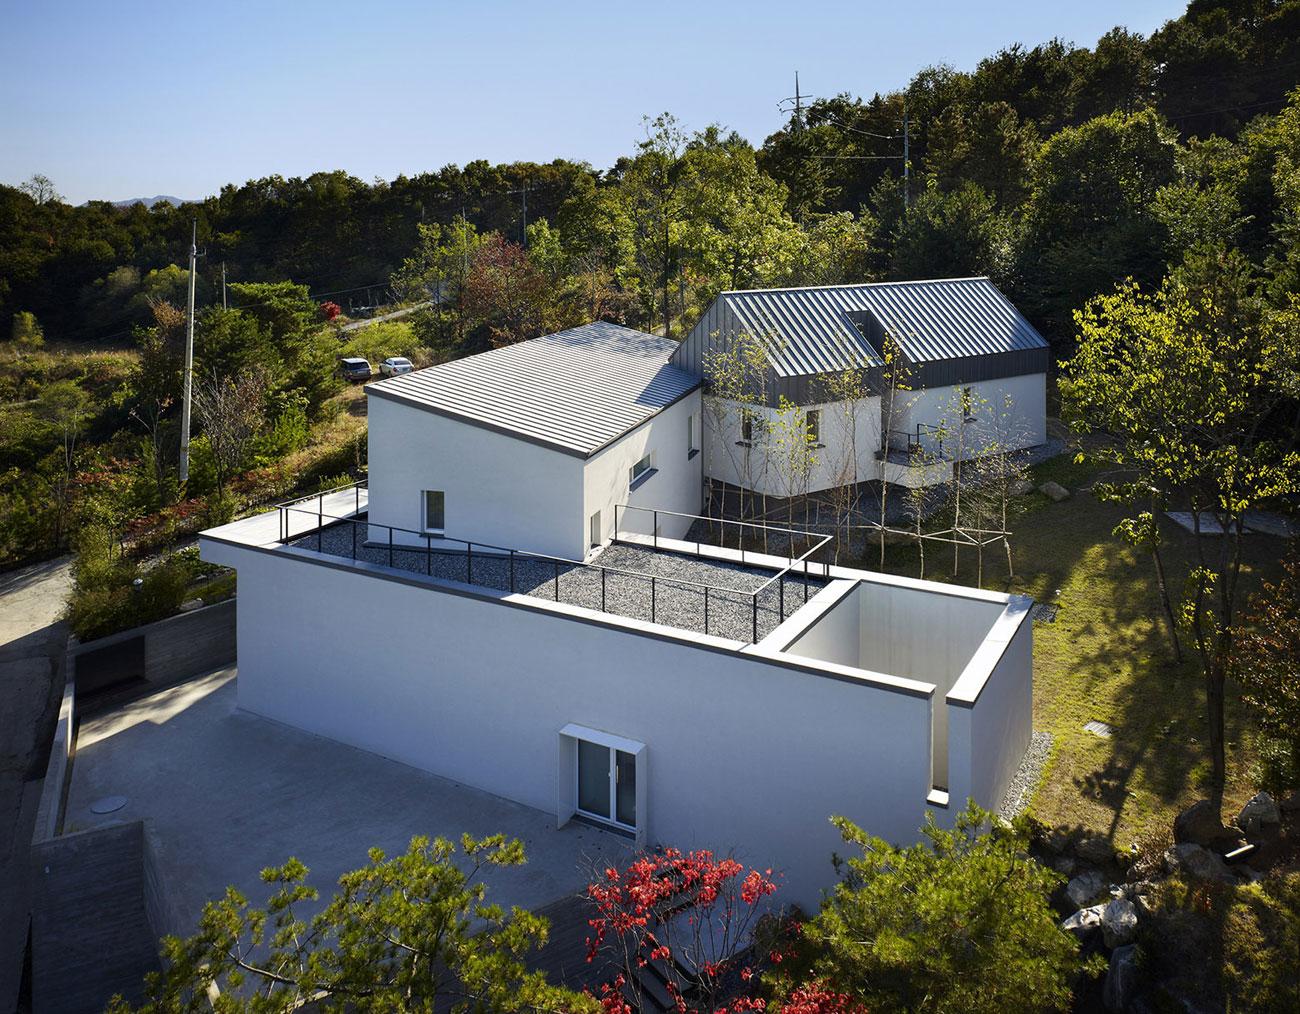 Yangpyeong Passive House by Engineforce Architect-03